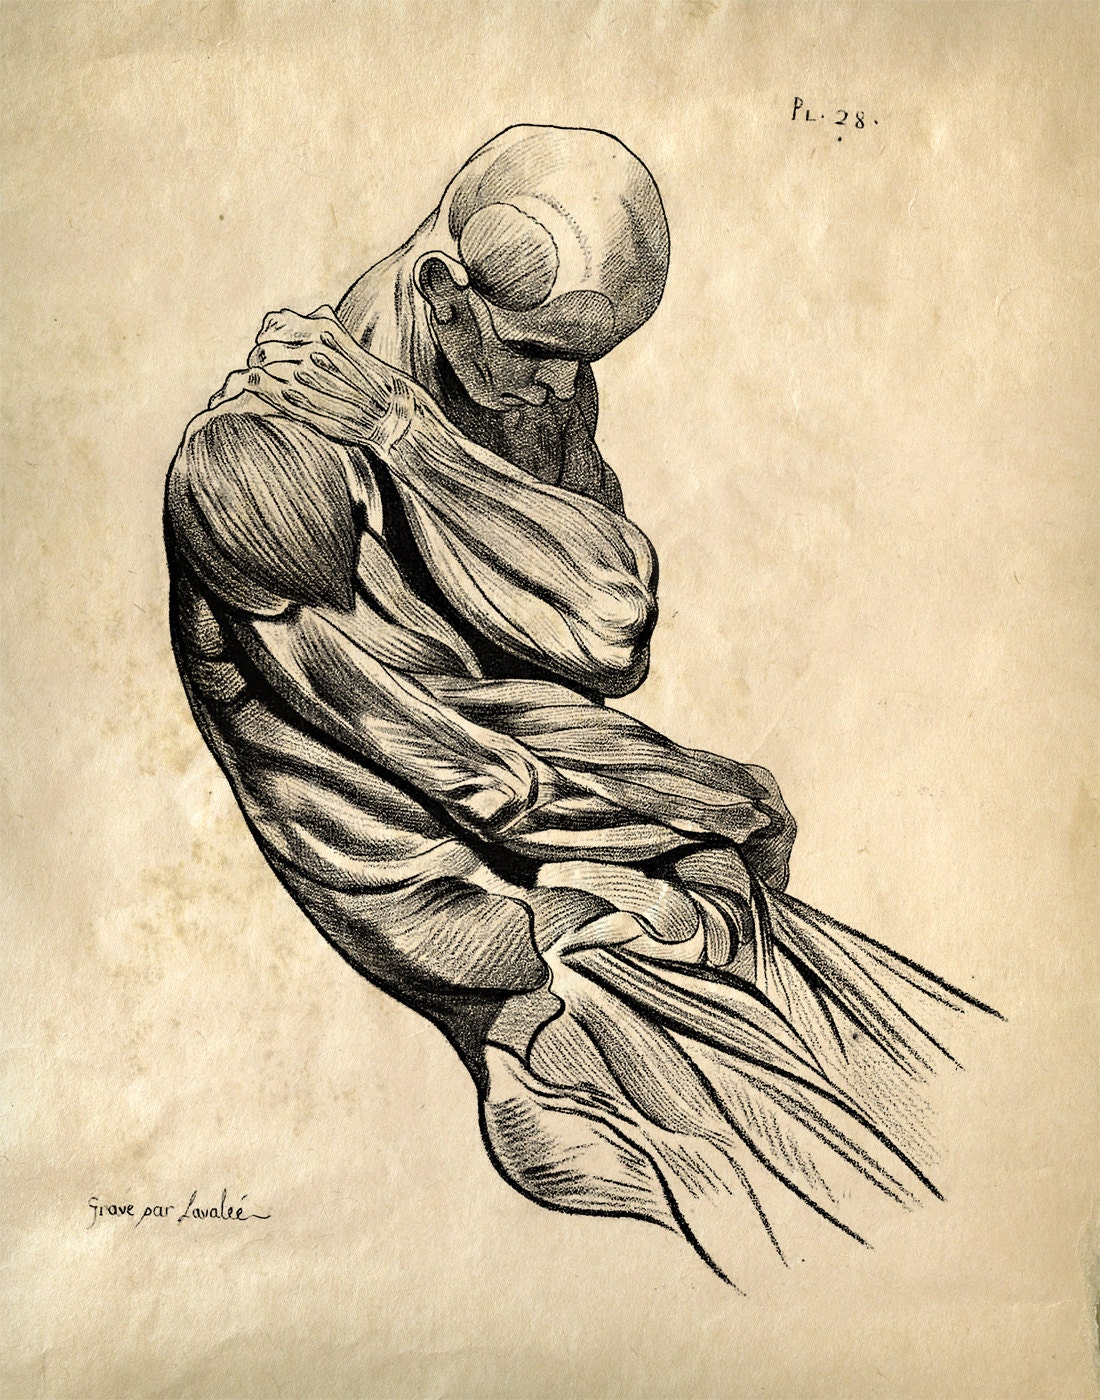 Human Anatomy / Medicine - Curious Prints